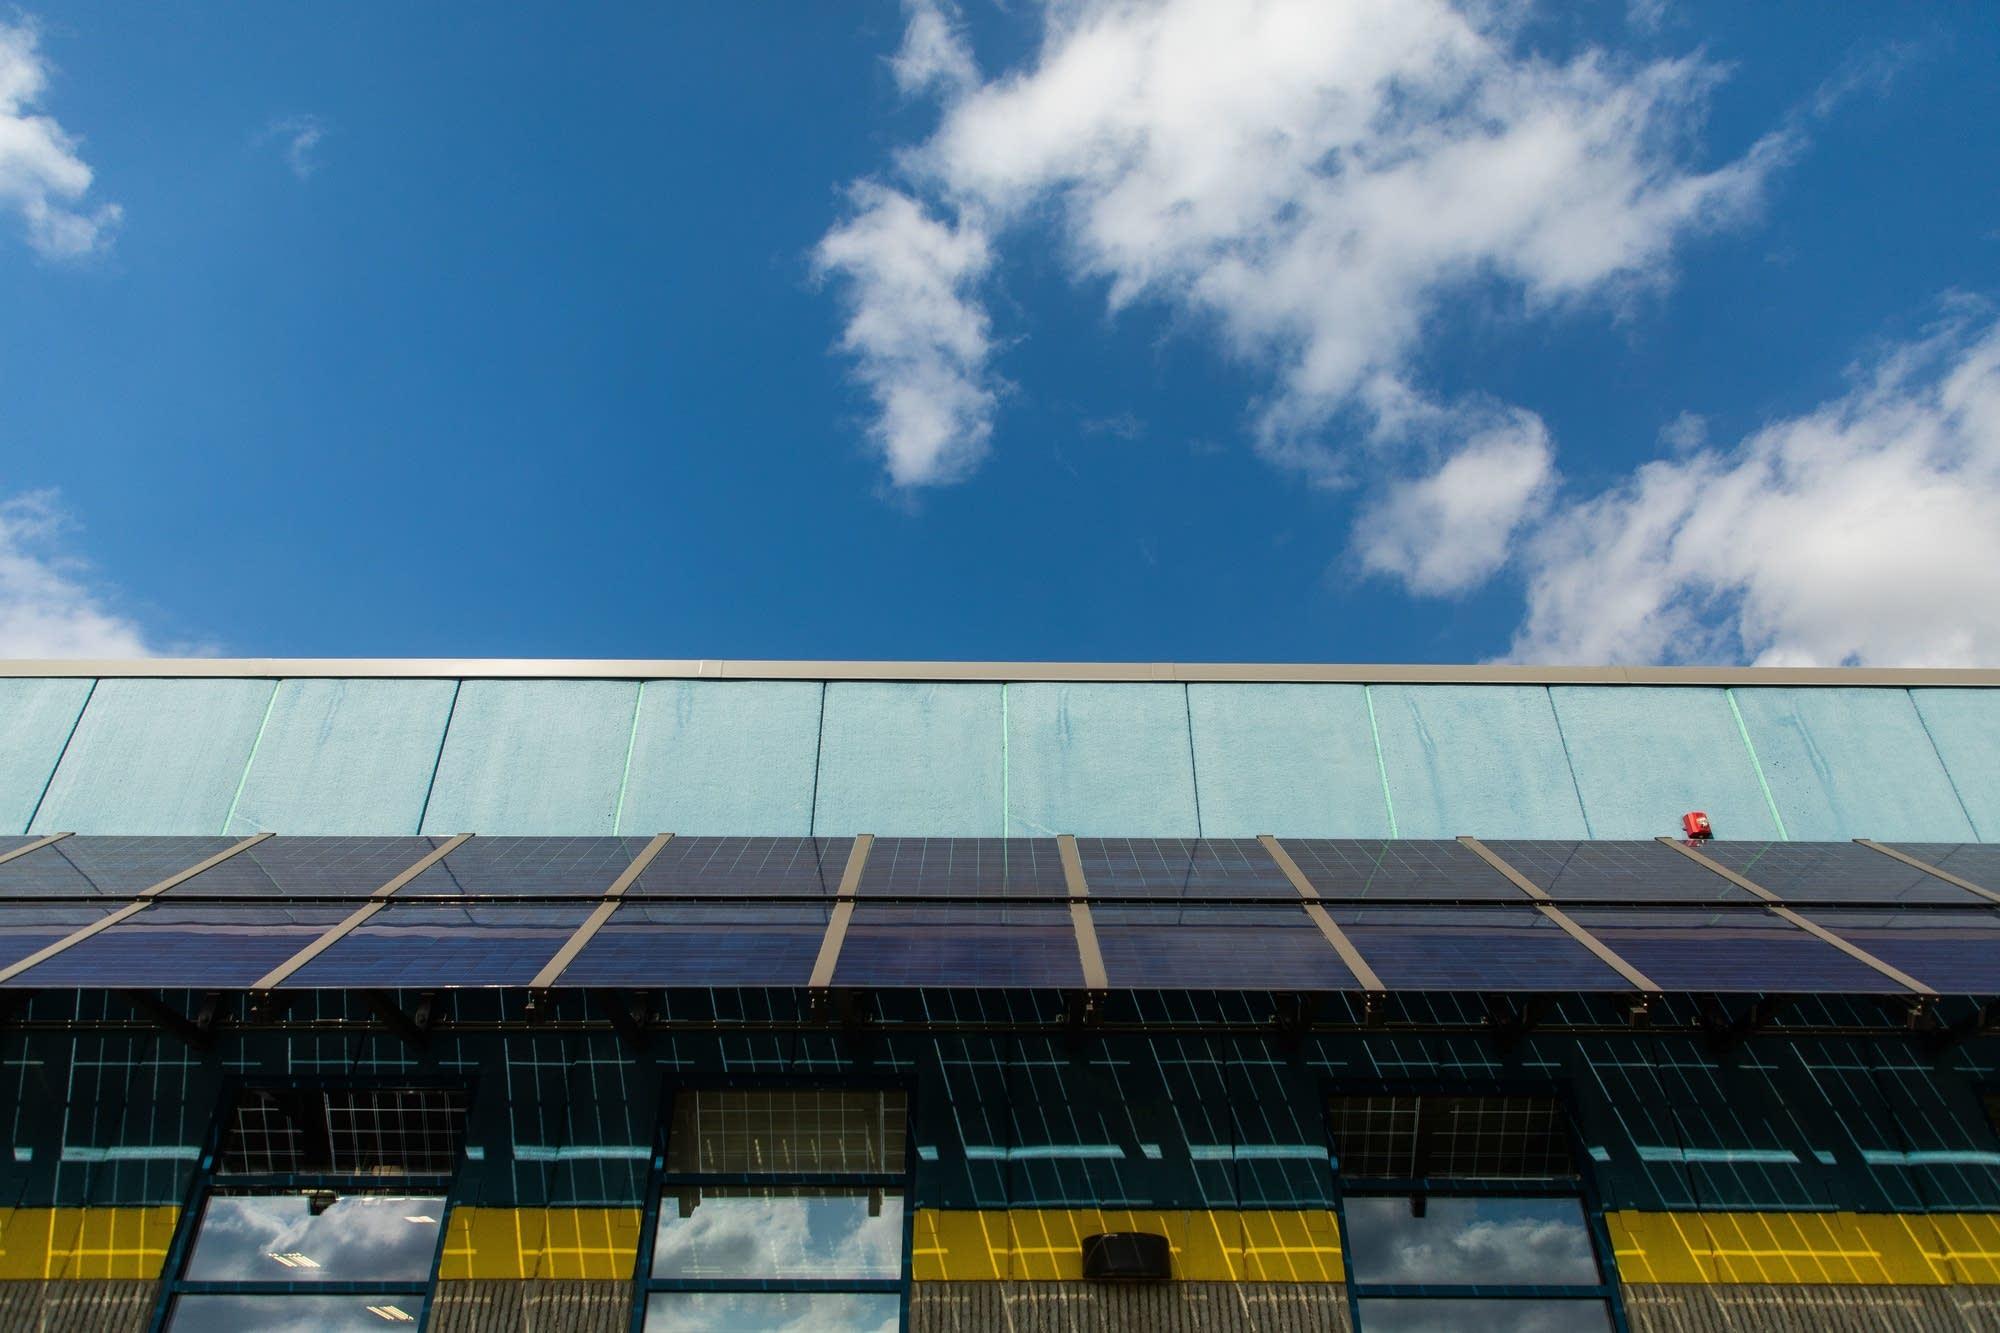 Sunny skies meet solar panels.